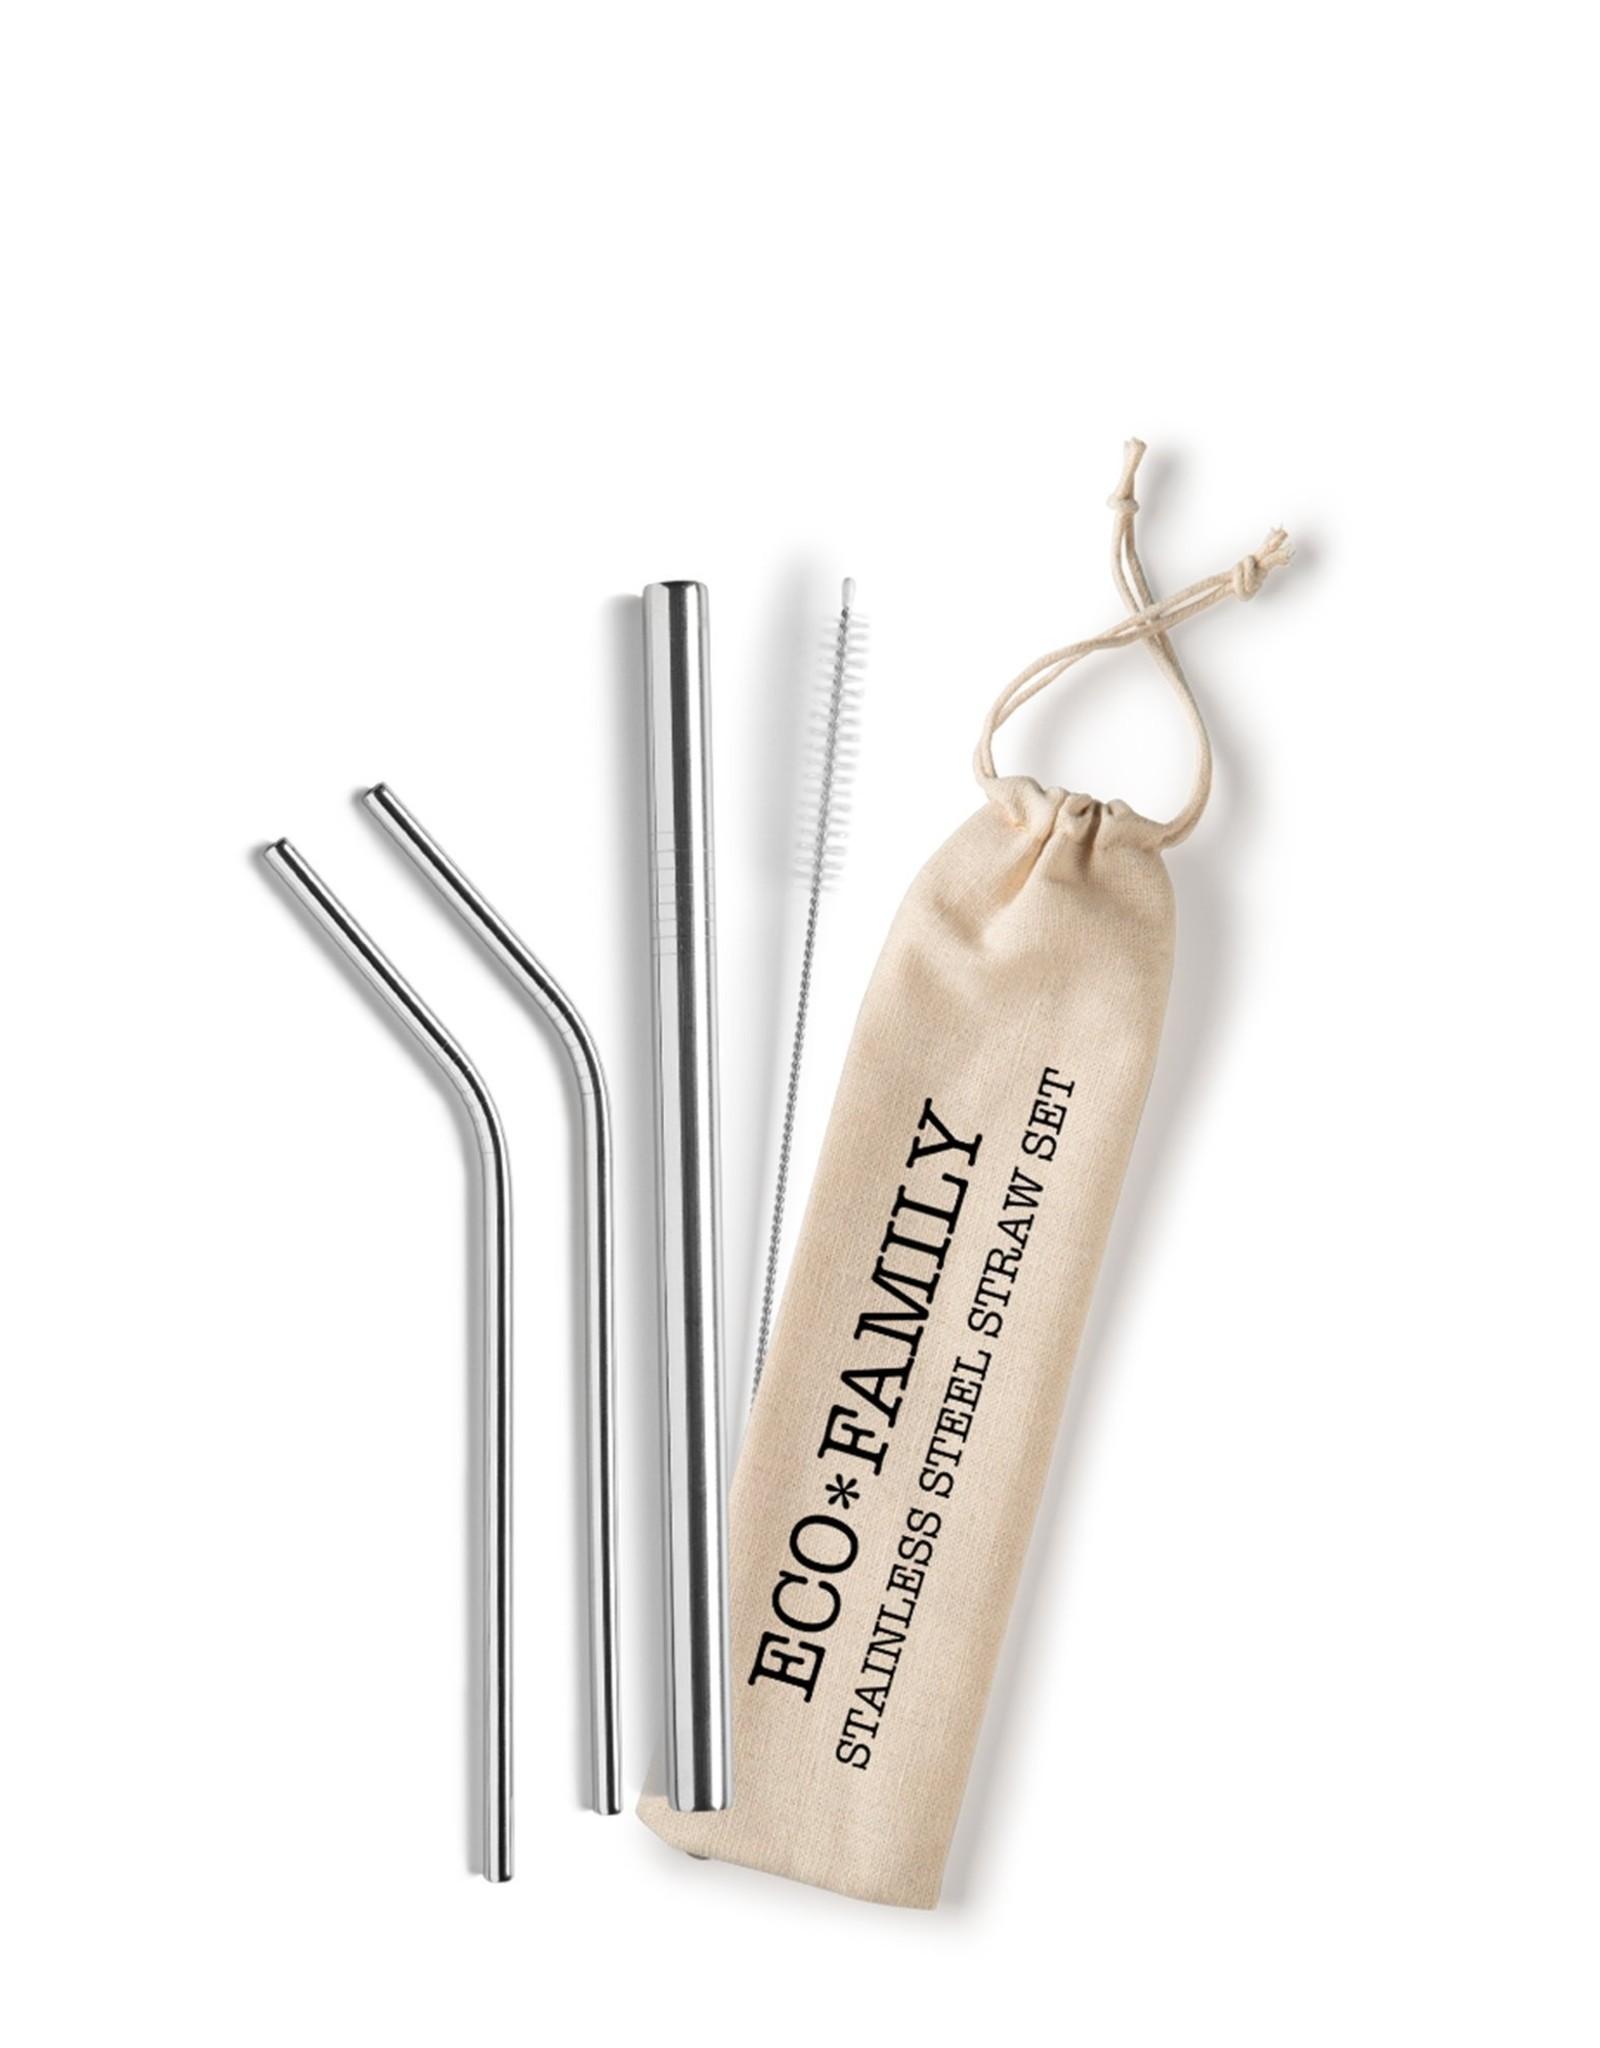 Shell Creek Sellers - Stainless Steel Straws